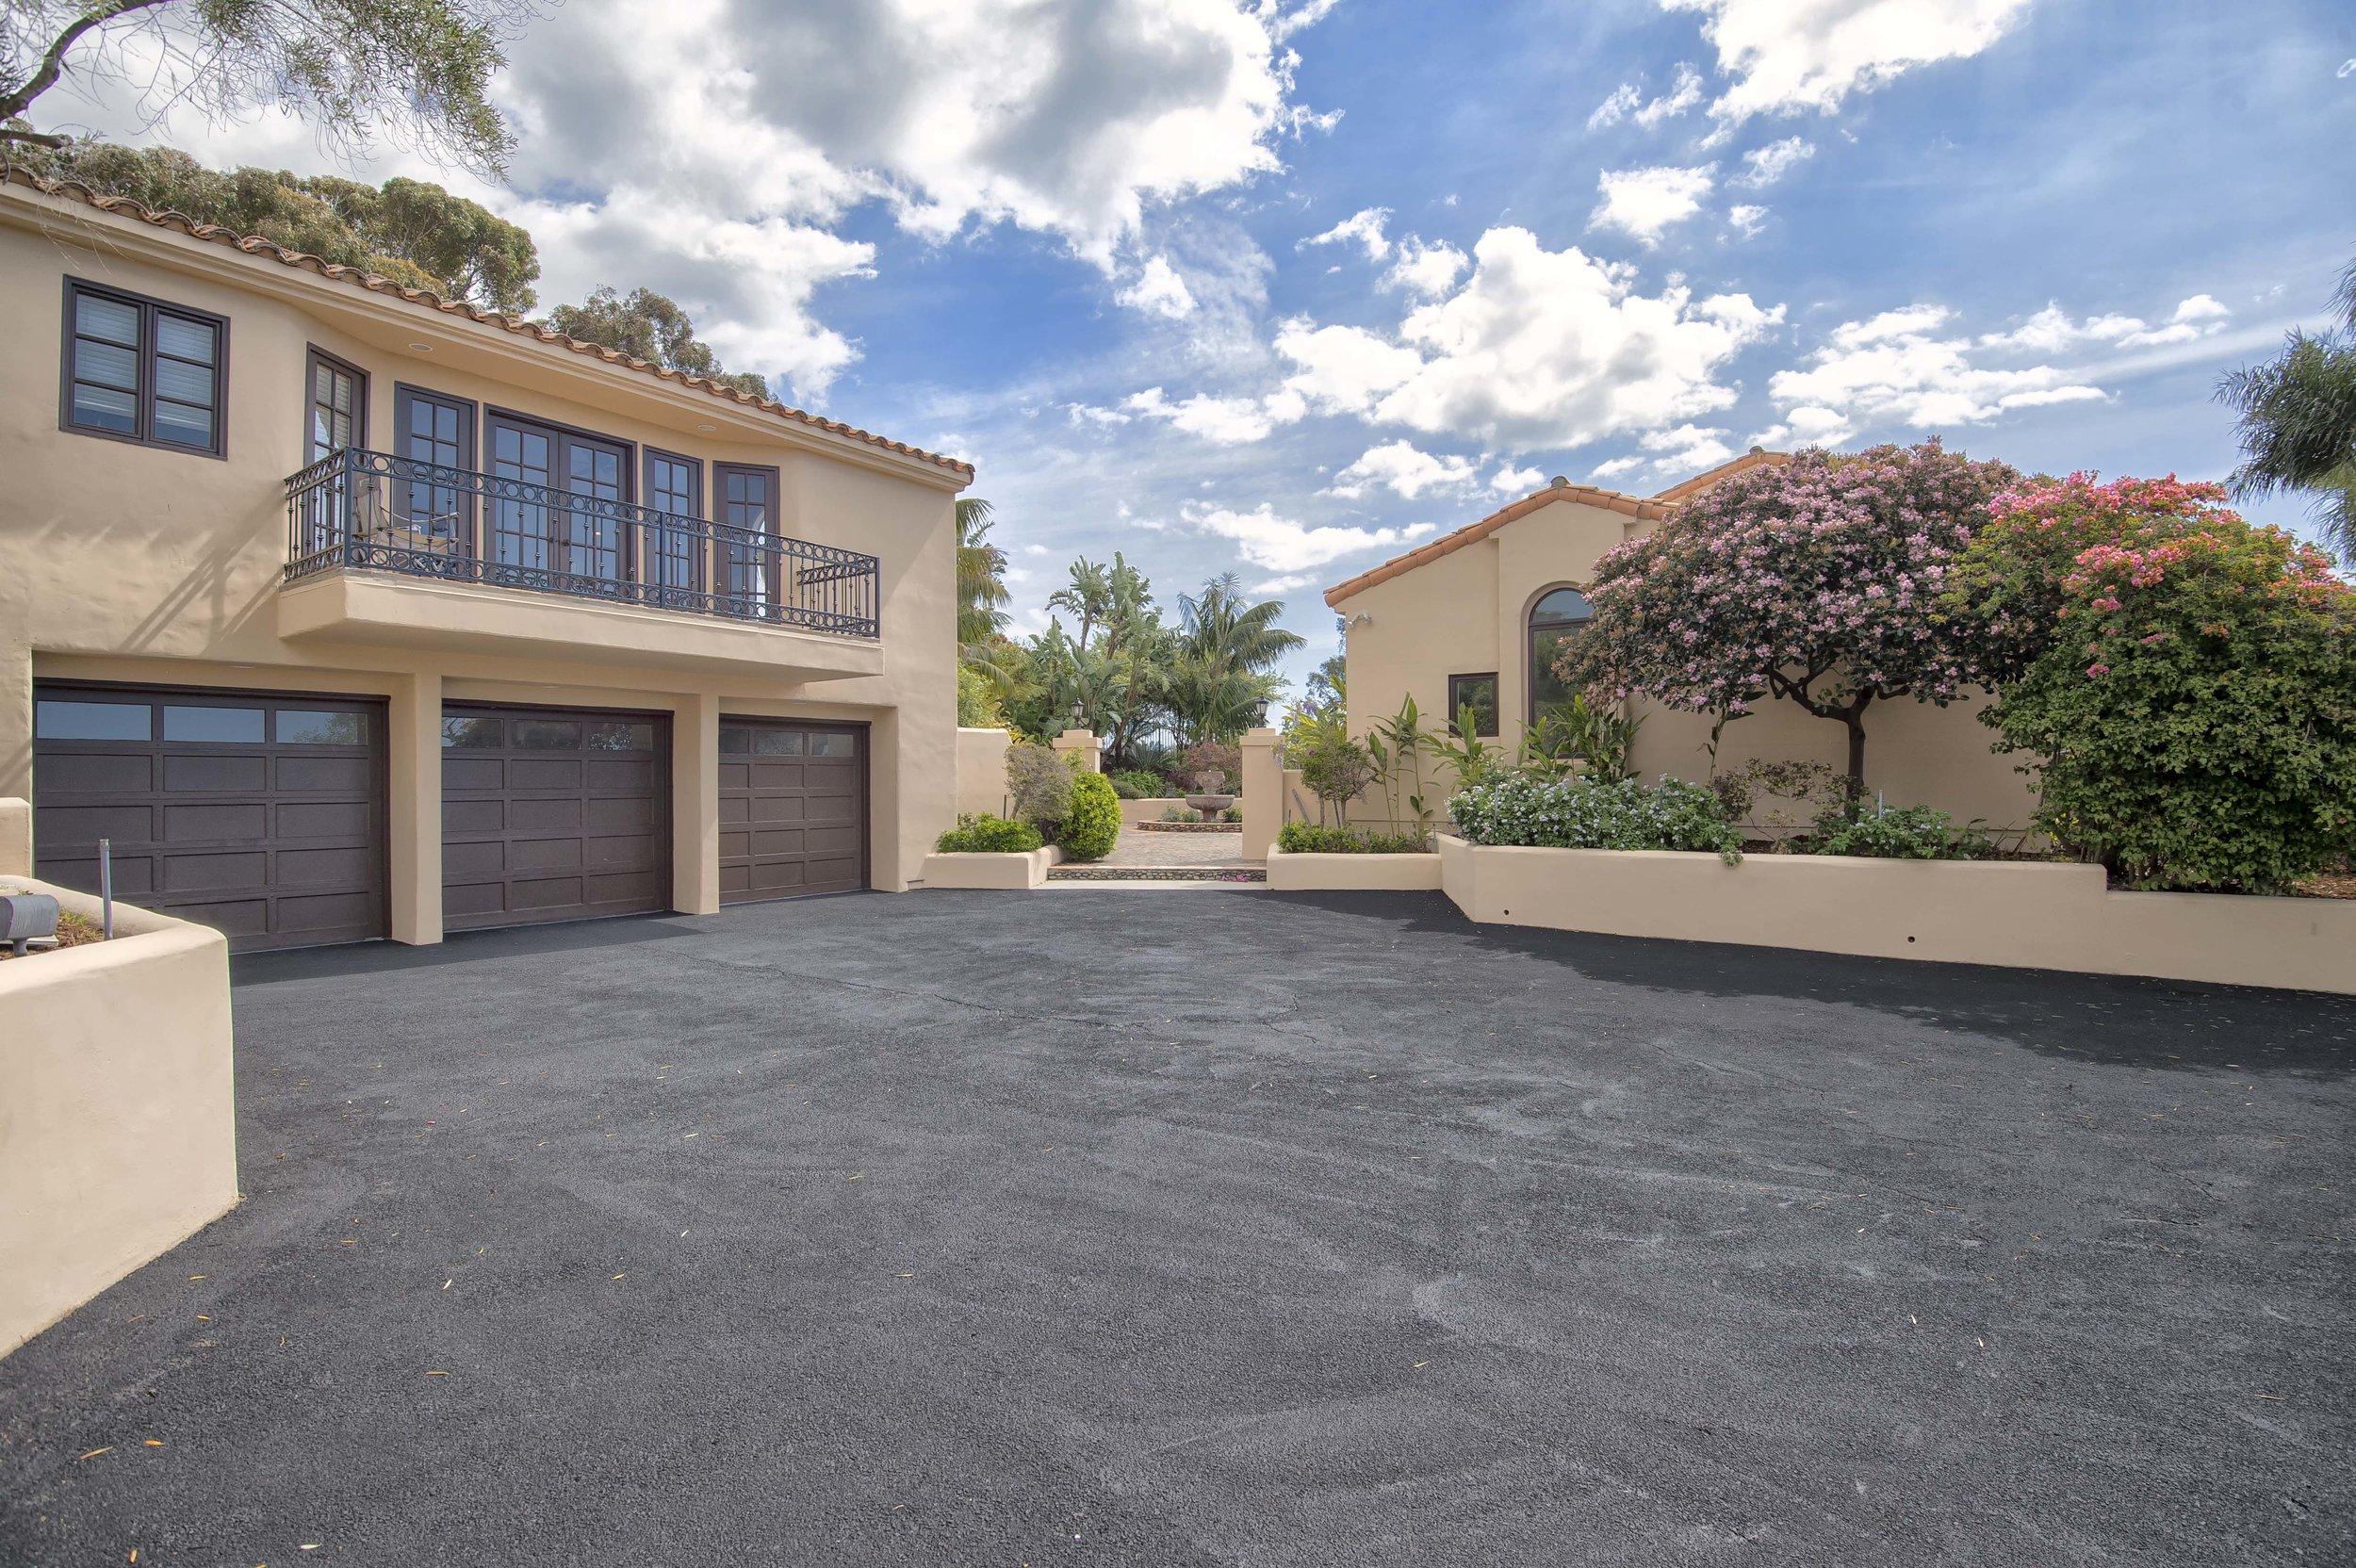 020 Garage 6130 Via Cabrillo For Sale Lease The Malibu Life Team Luxury Real Estate.jpg